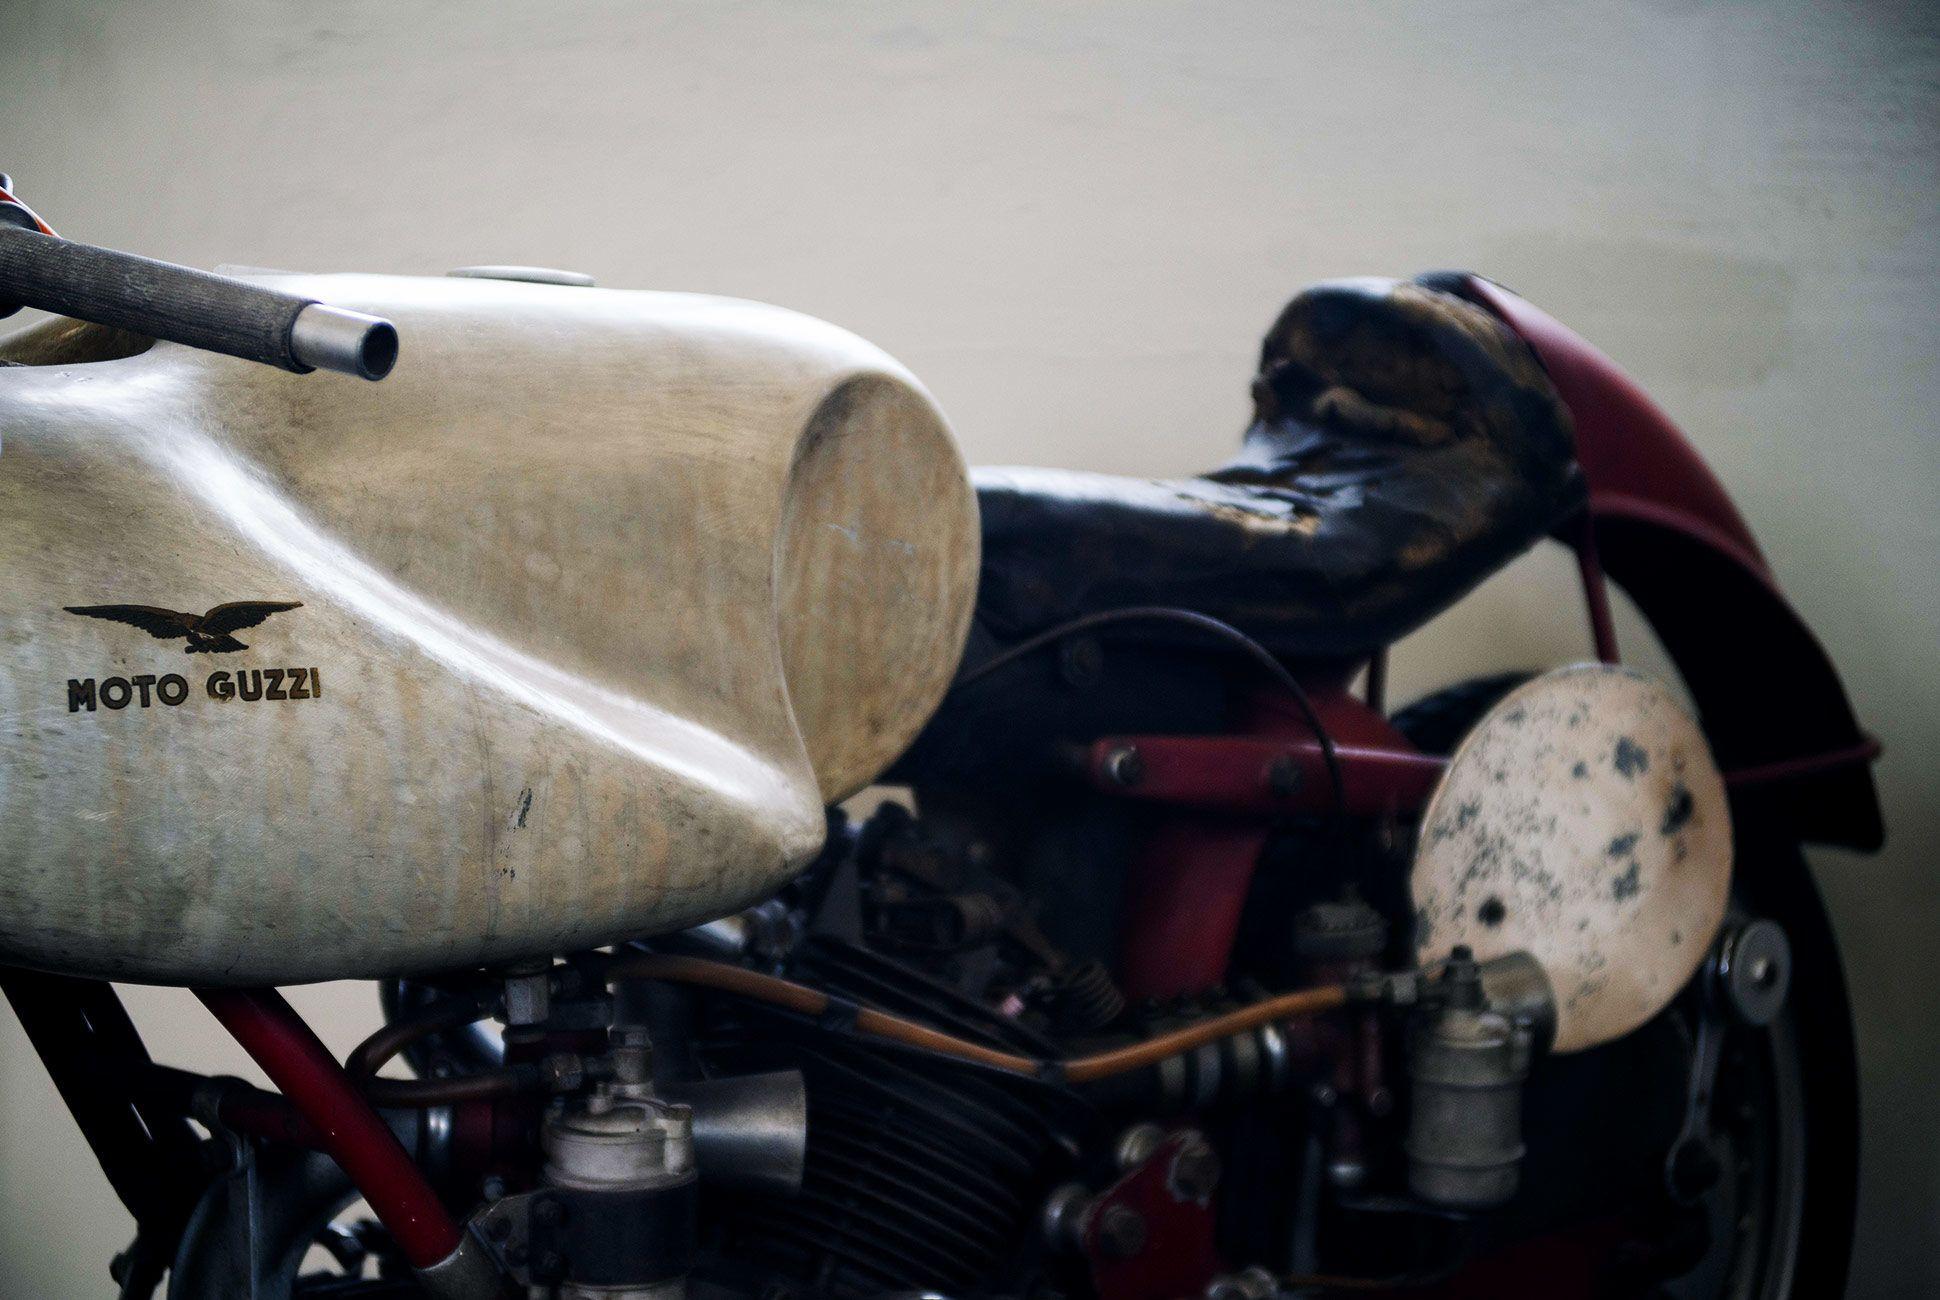 Moto-Guzzi-Factory-Tour-gear-patrol-slide-6